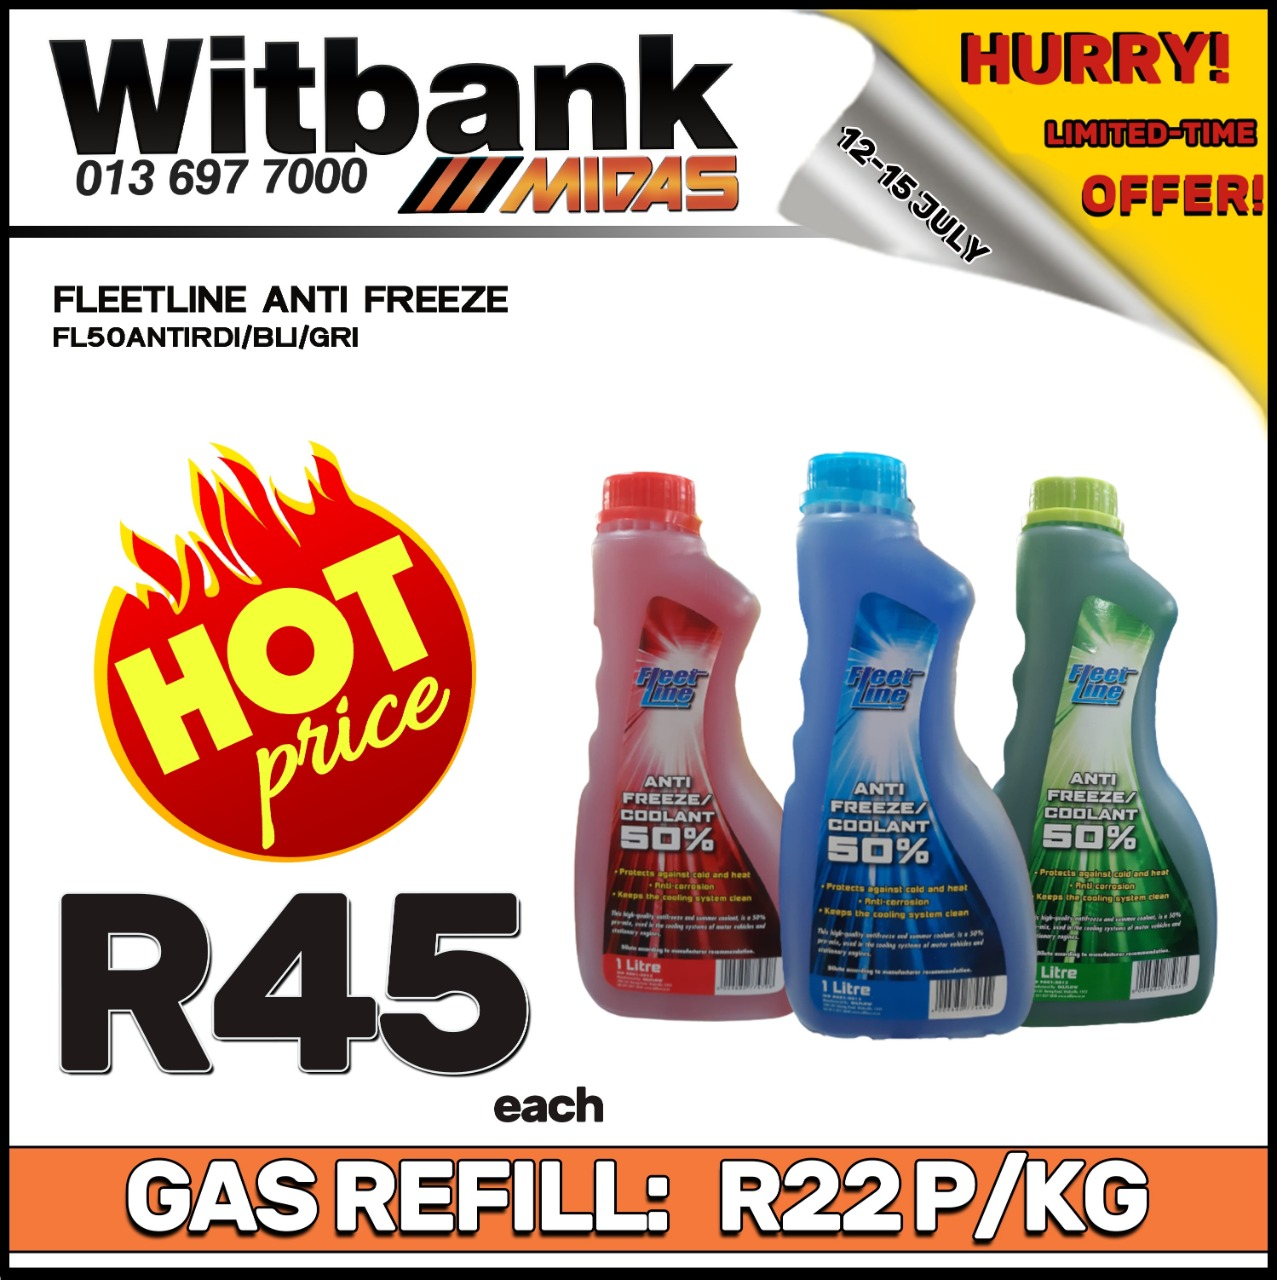 Fleetline Antifreeze 1L ONLY at Midas Witbank!